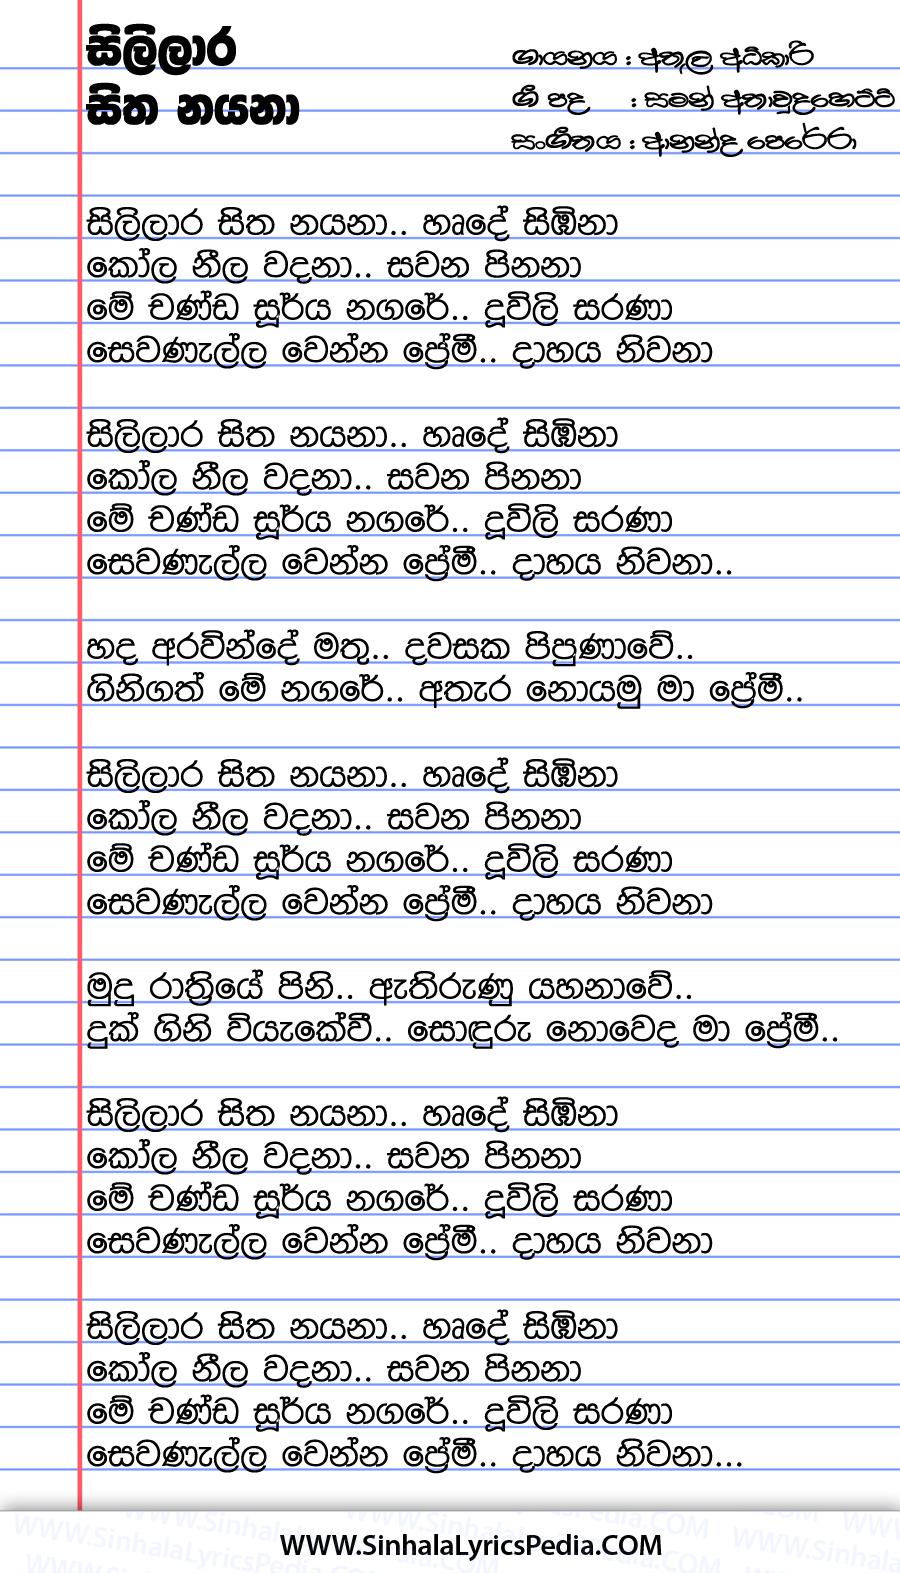 Sililara Sitha Nayana Song Lyrics